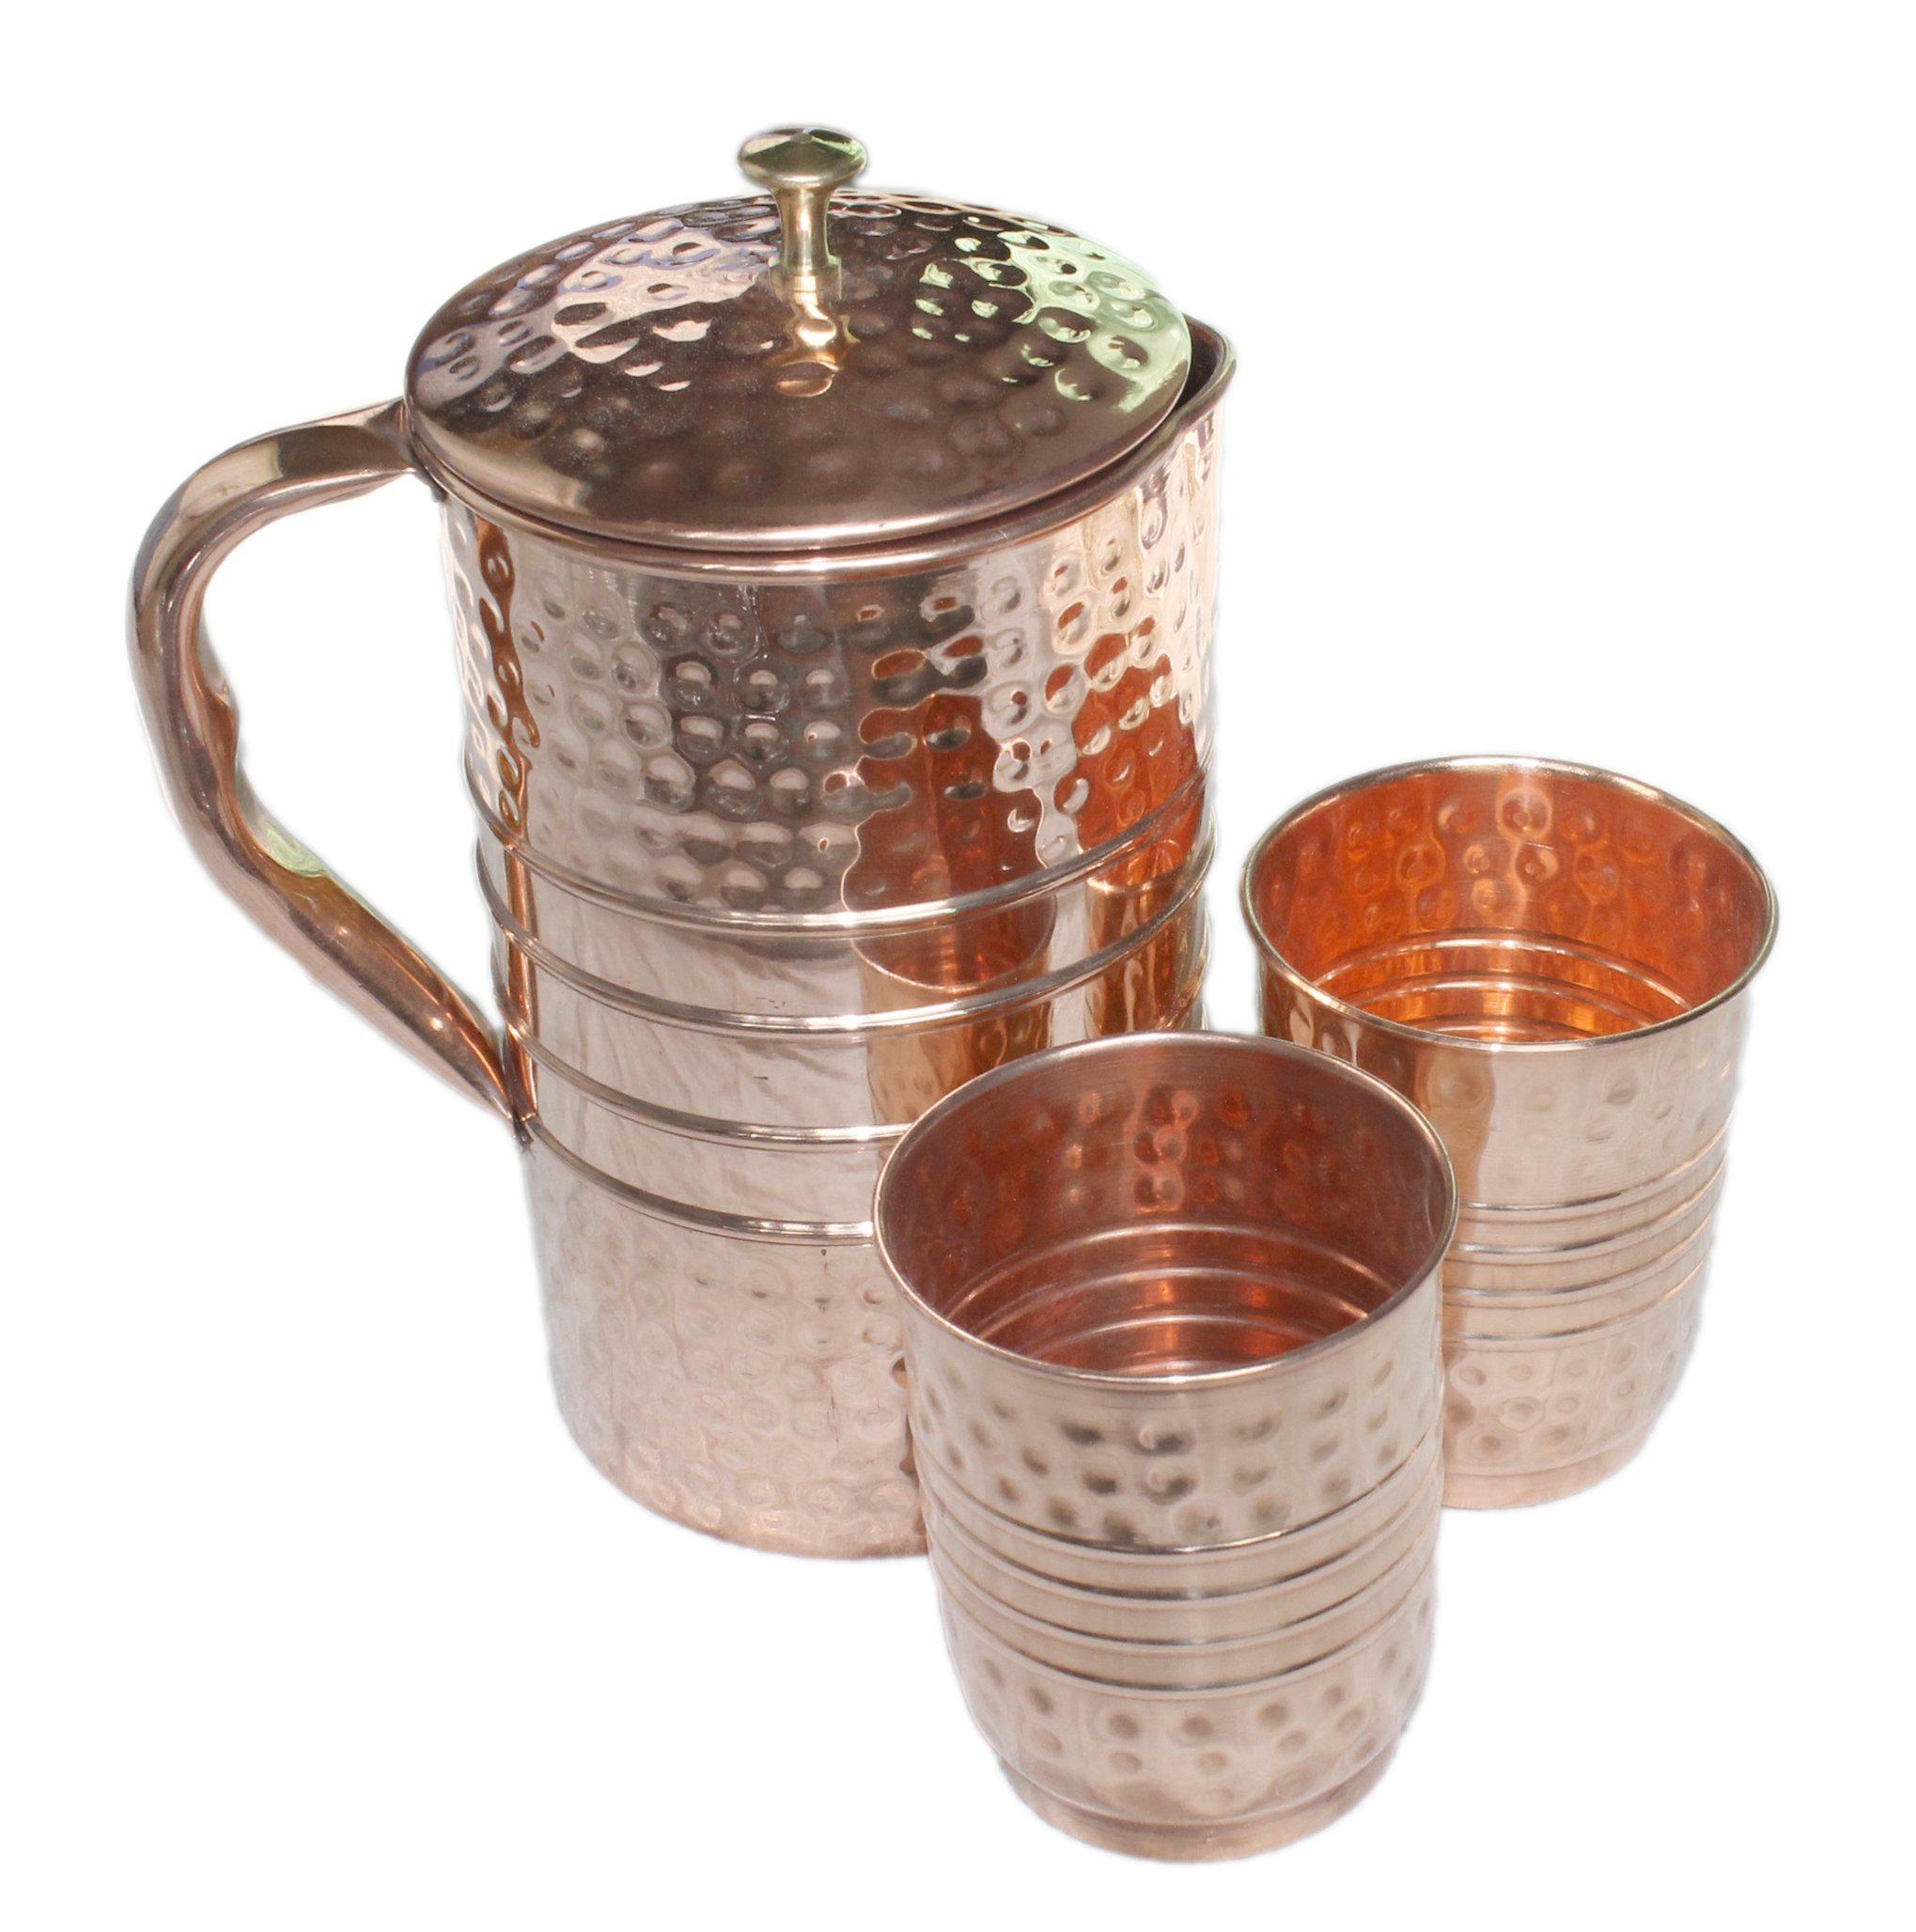 PARIJAT HANDICRAFT Ayurvedic Pure Copper Water Pitcher Jug Set 2 Water Glasses Cup Tumbler Jug Capacity 54 Ounce Glass Capacity 10 Ounce Copper Hammered